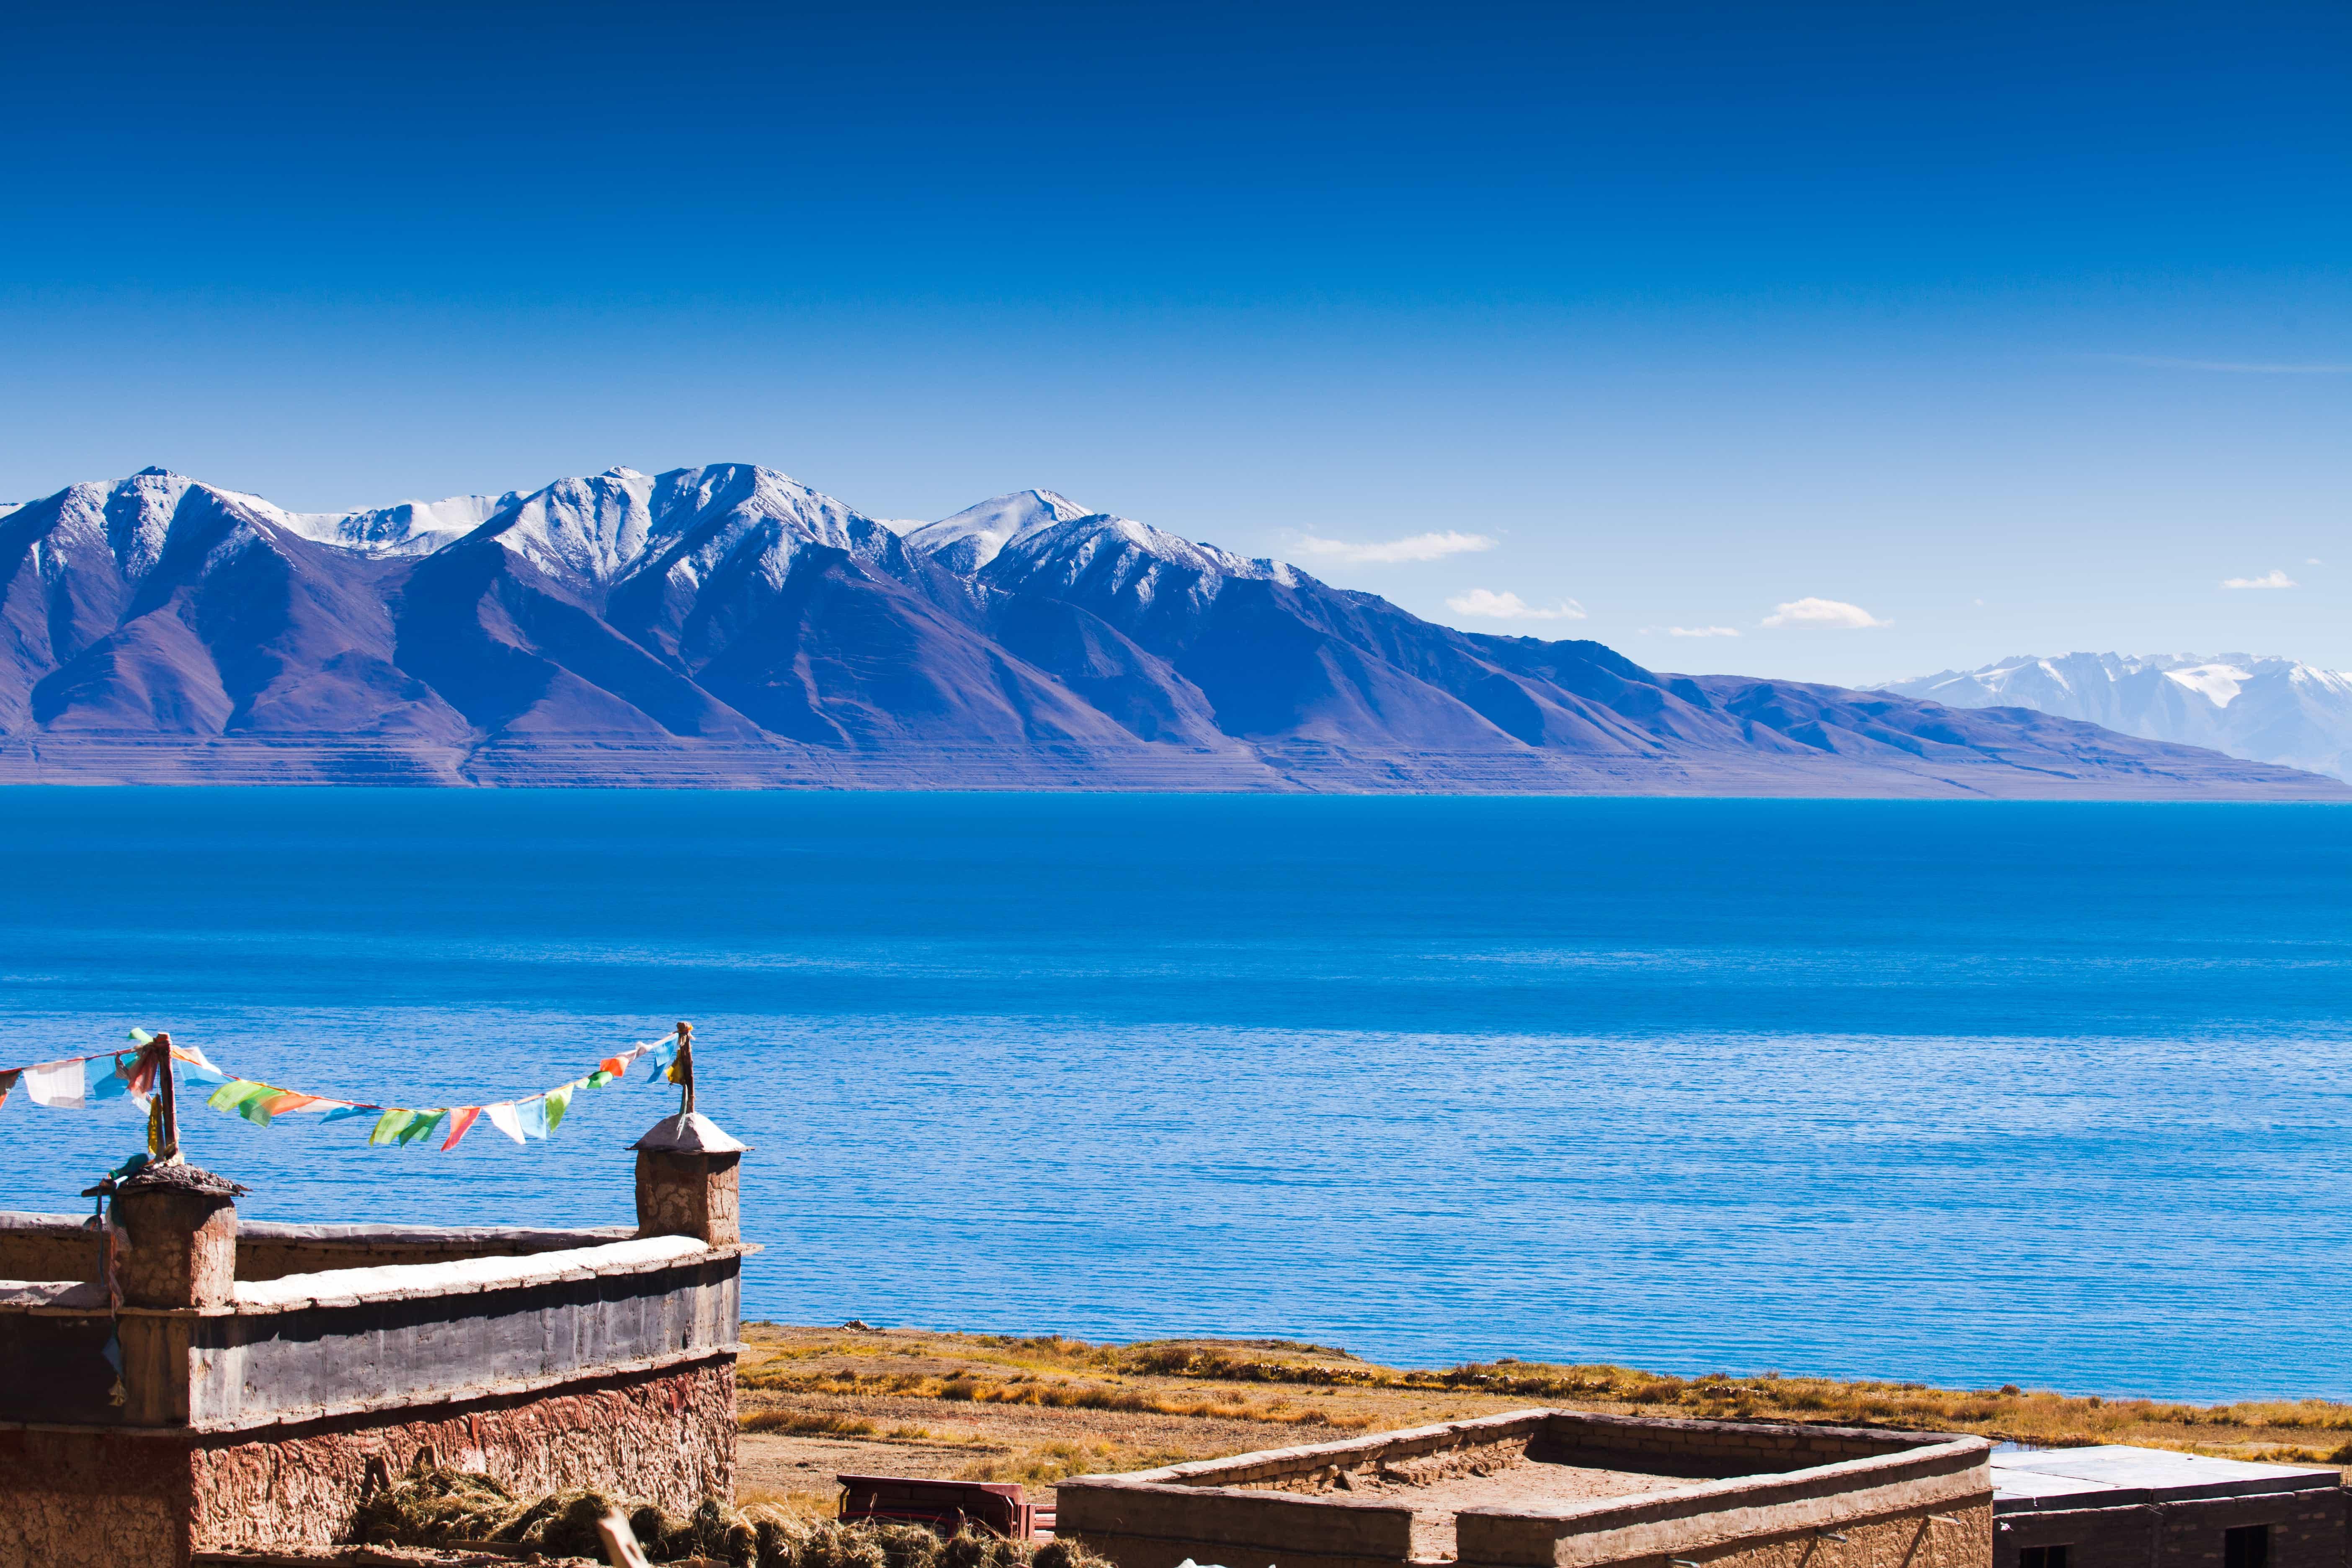 Tangra Yumco Lake Tibet